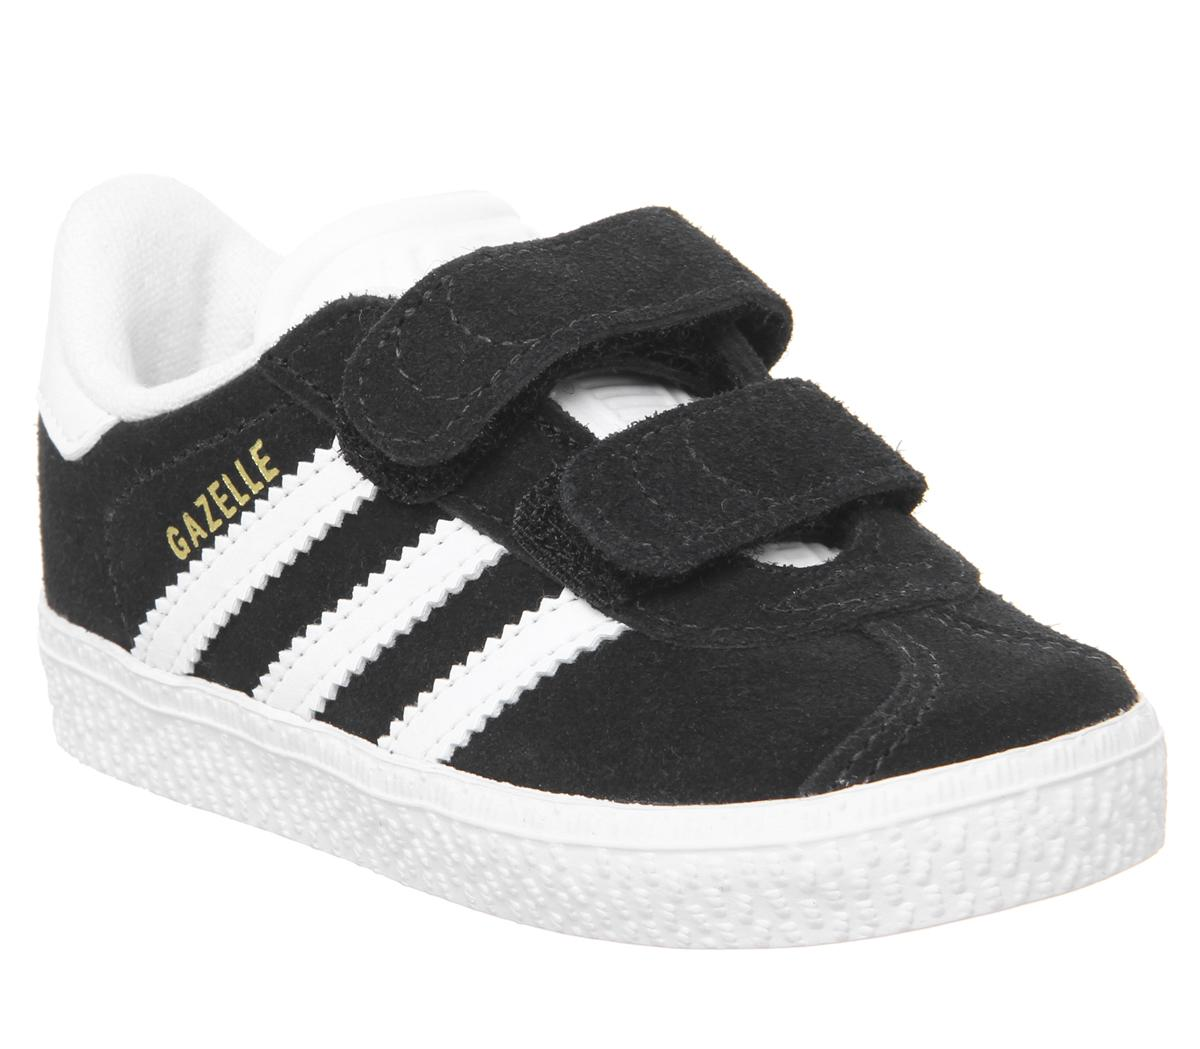 adidas Gazelle 2 Infant Trainers Core